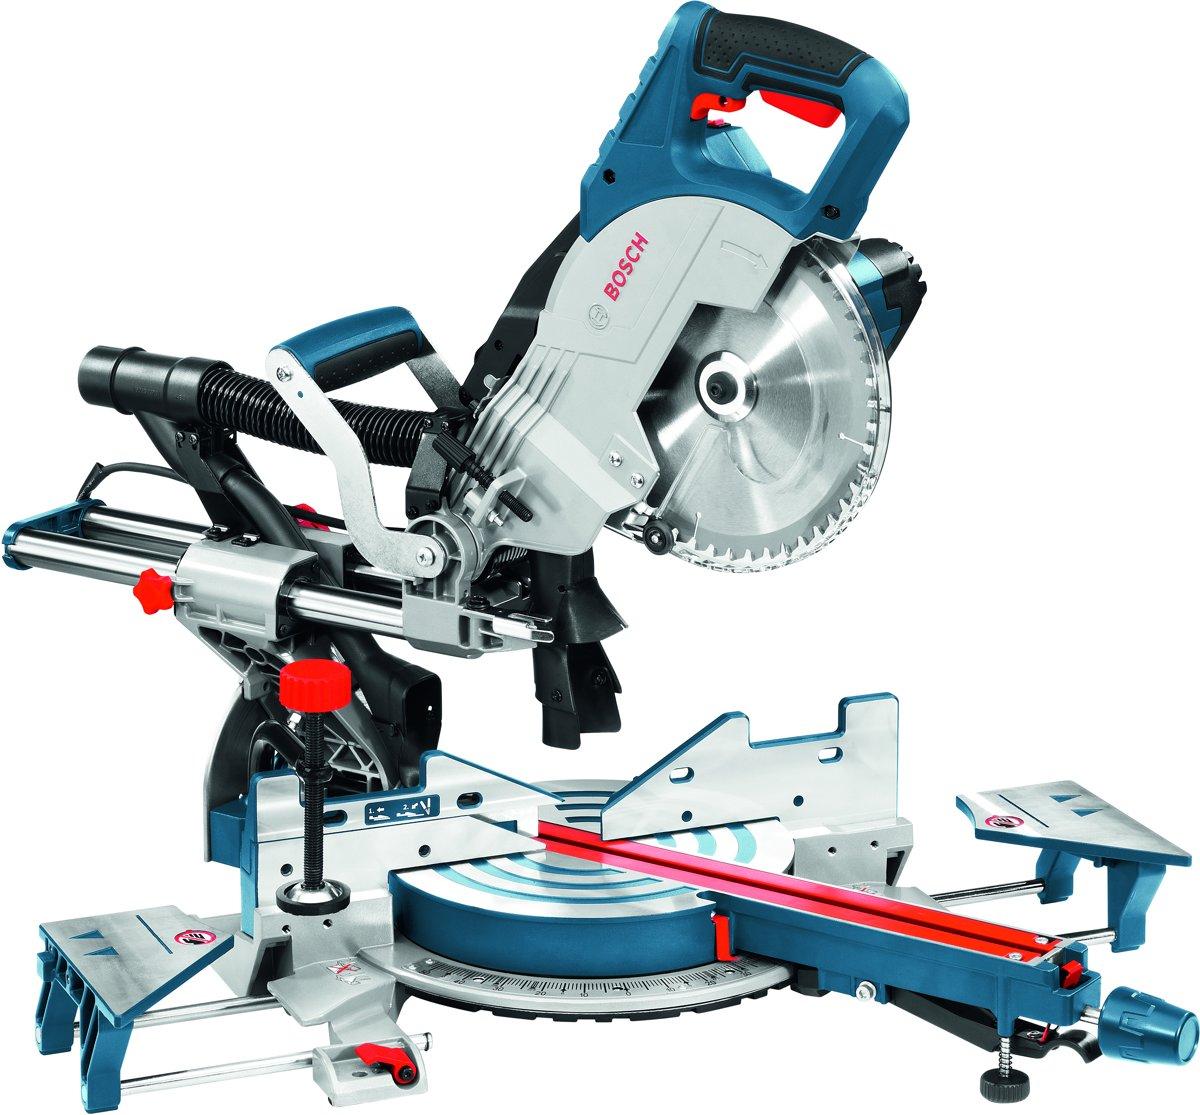 Paneelzaag Bosch Professional GCM 8 SJL 1600 W 216 mm 30 mm